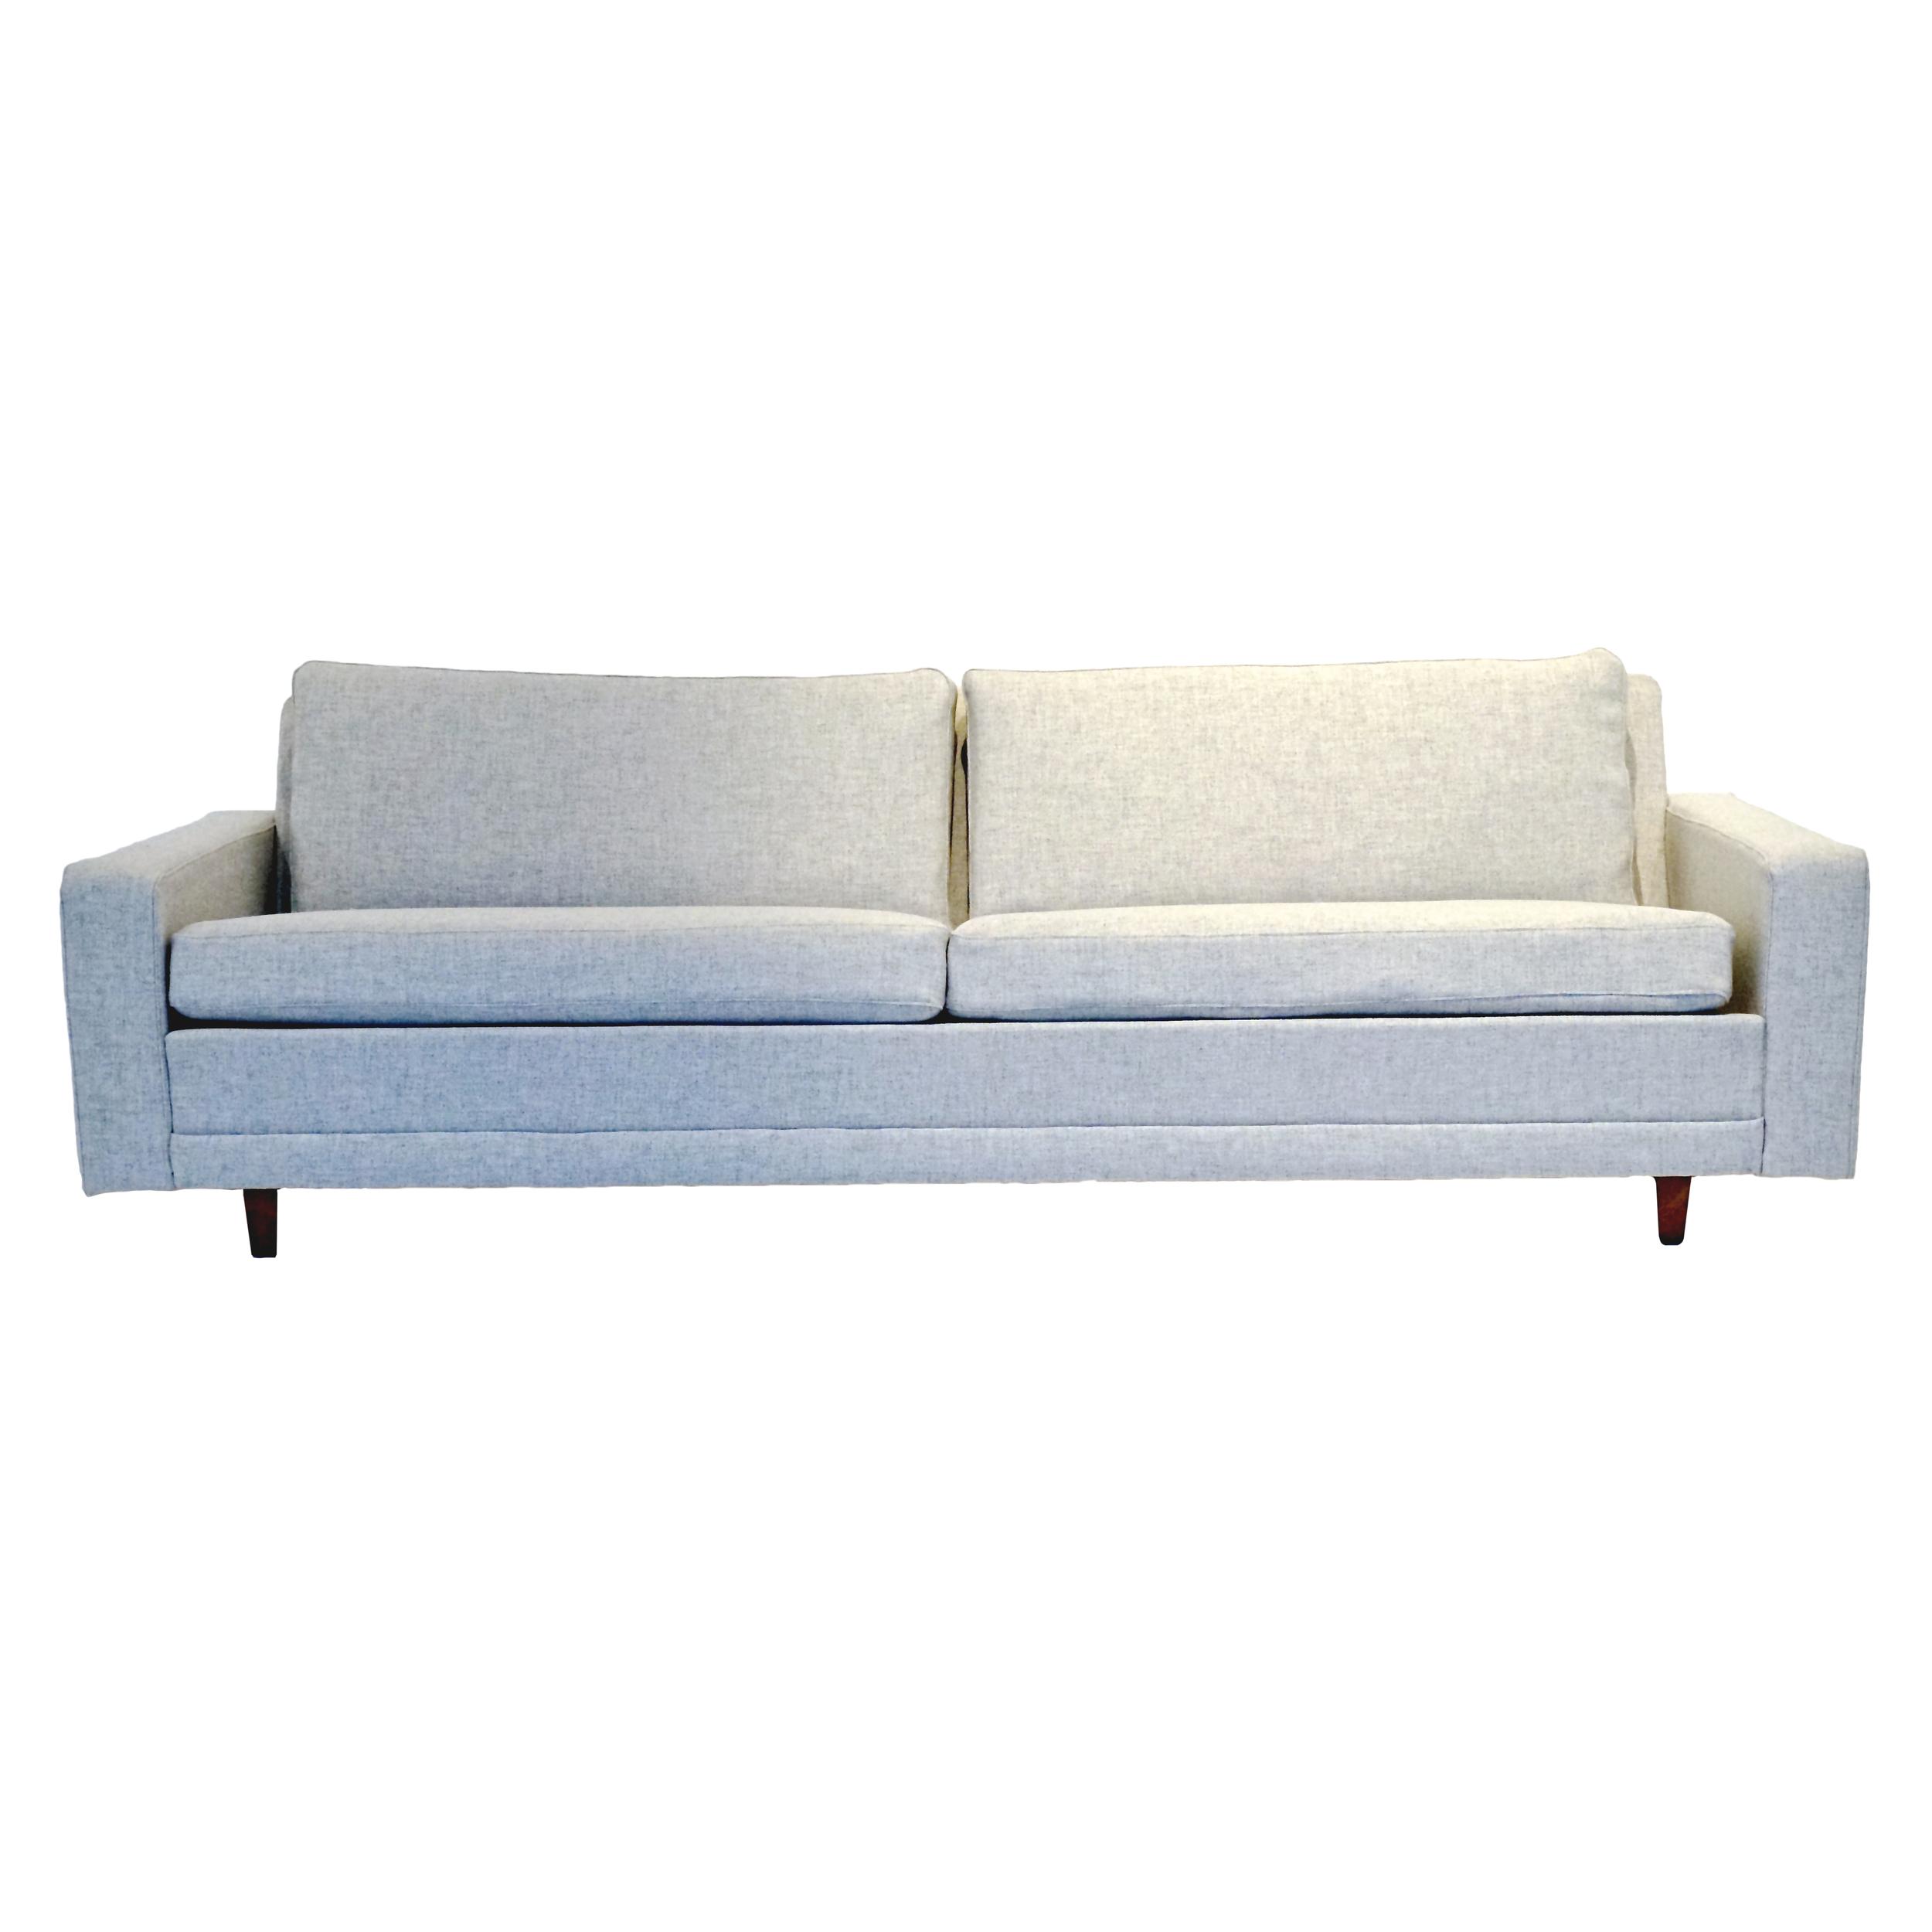 Dux, Grå  3-sits soffa.  L 207cm SittH38 D76   Lagerstatus: I lager.